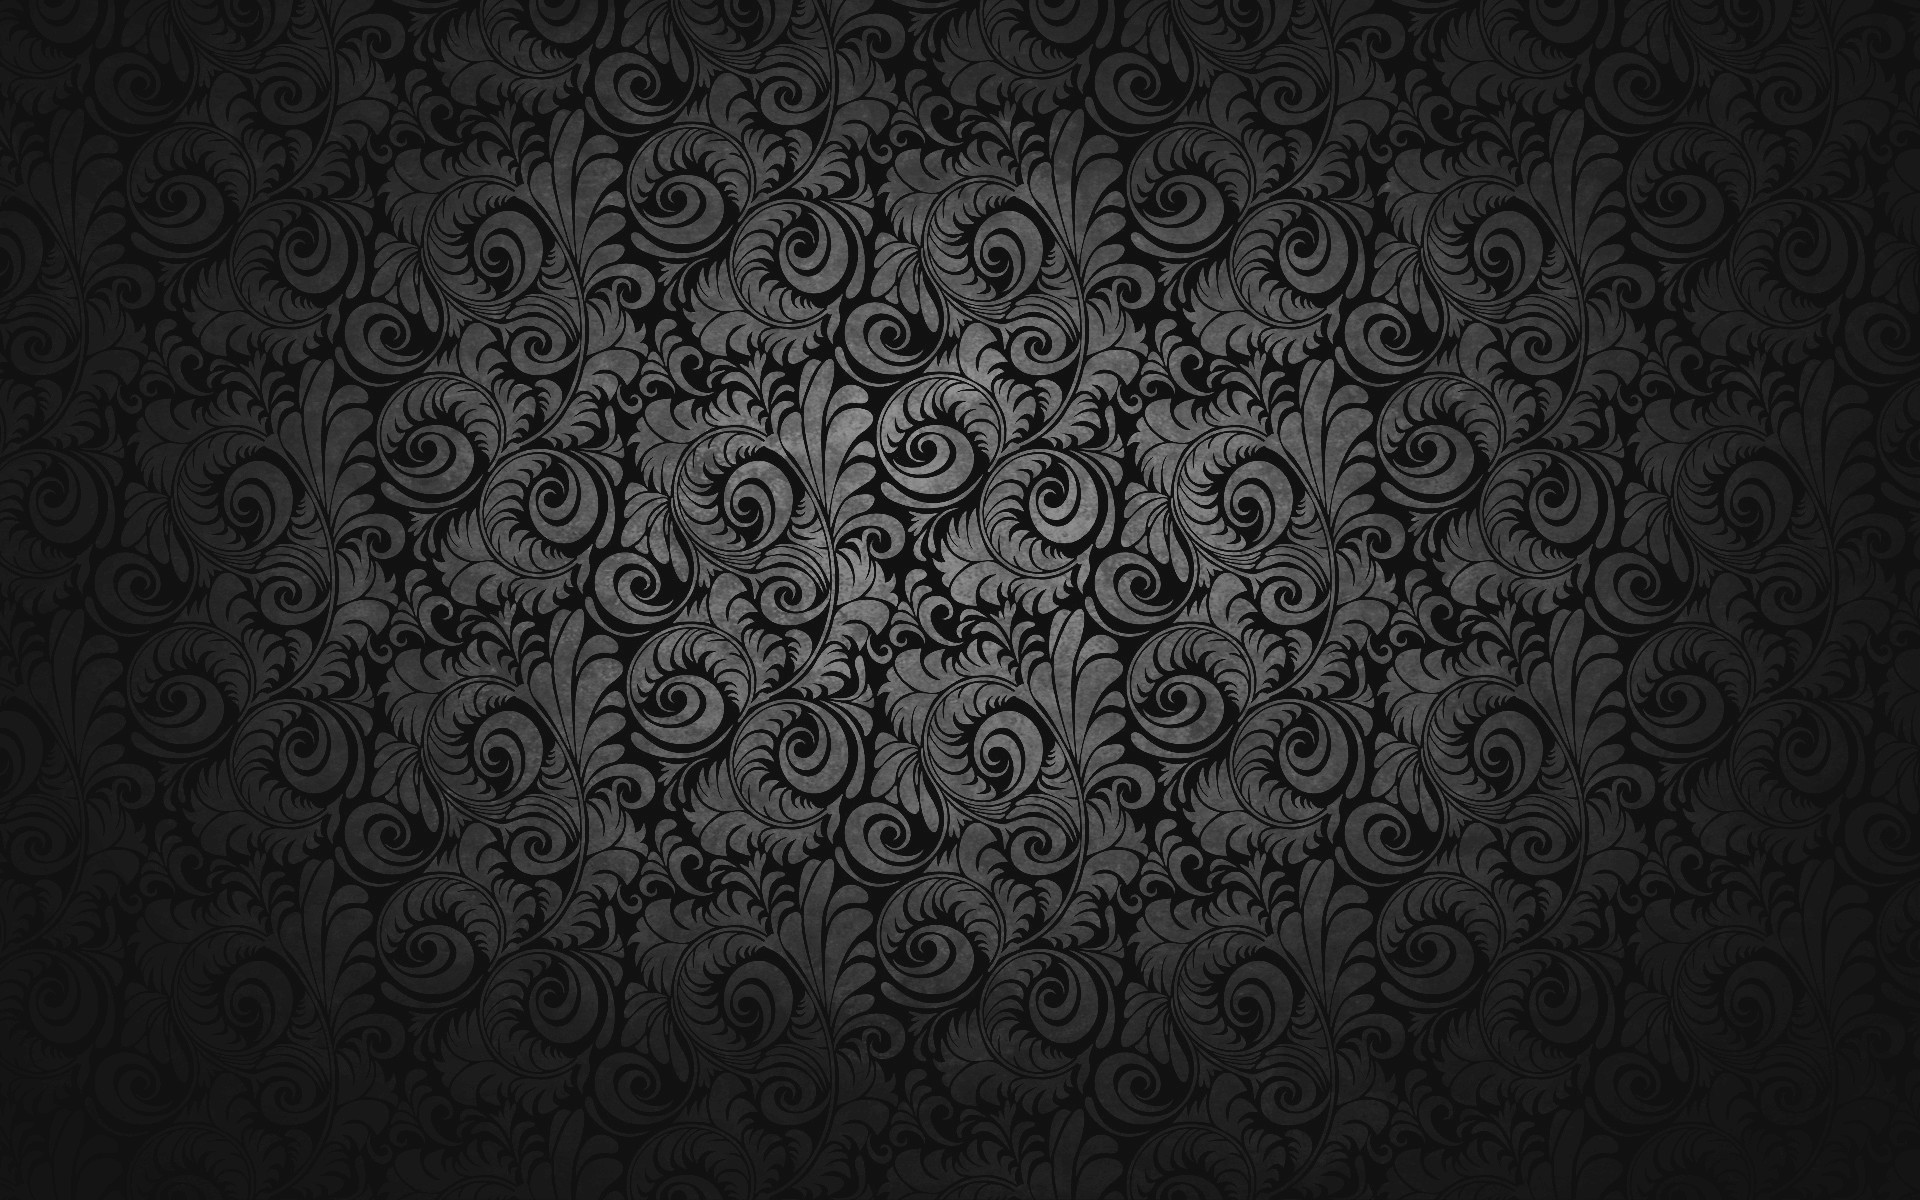 Black And Silver Wallpaper 32 Free Wallpaper. Black And Silver Wallpaper 32  Free Wallpaper